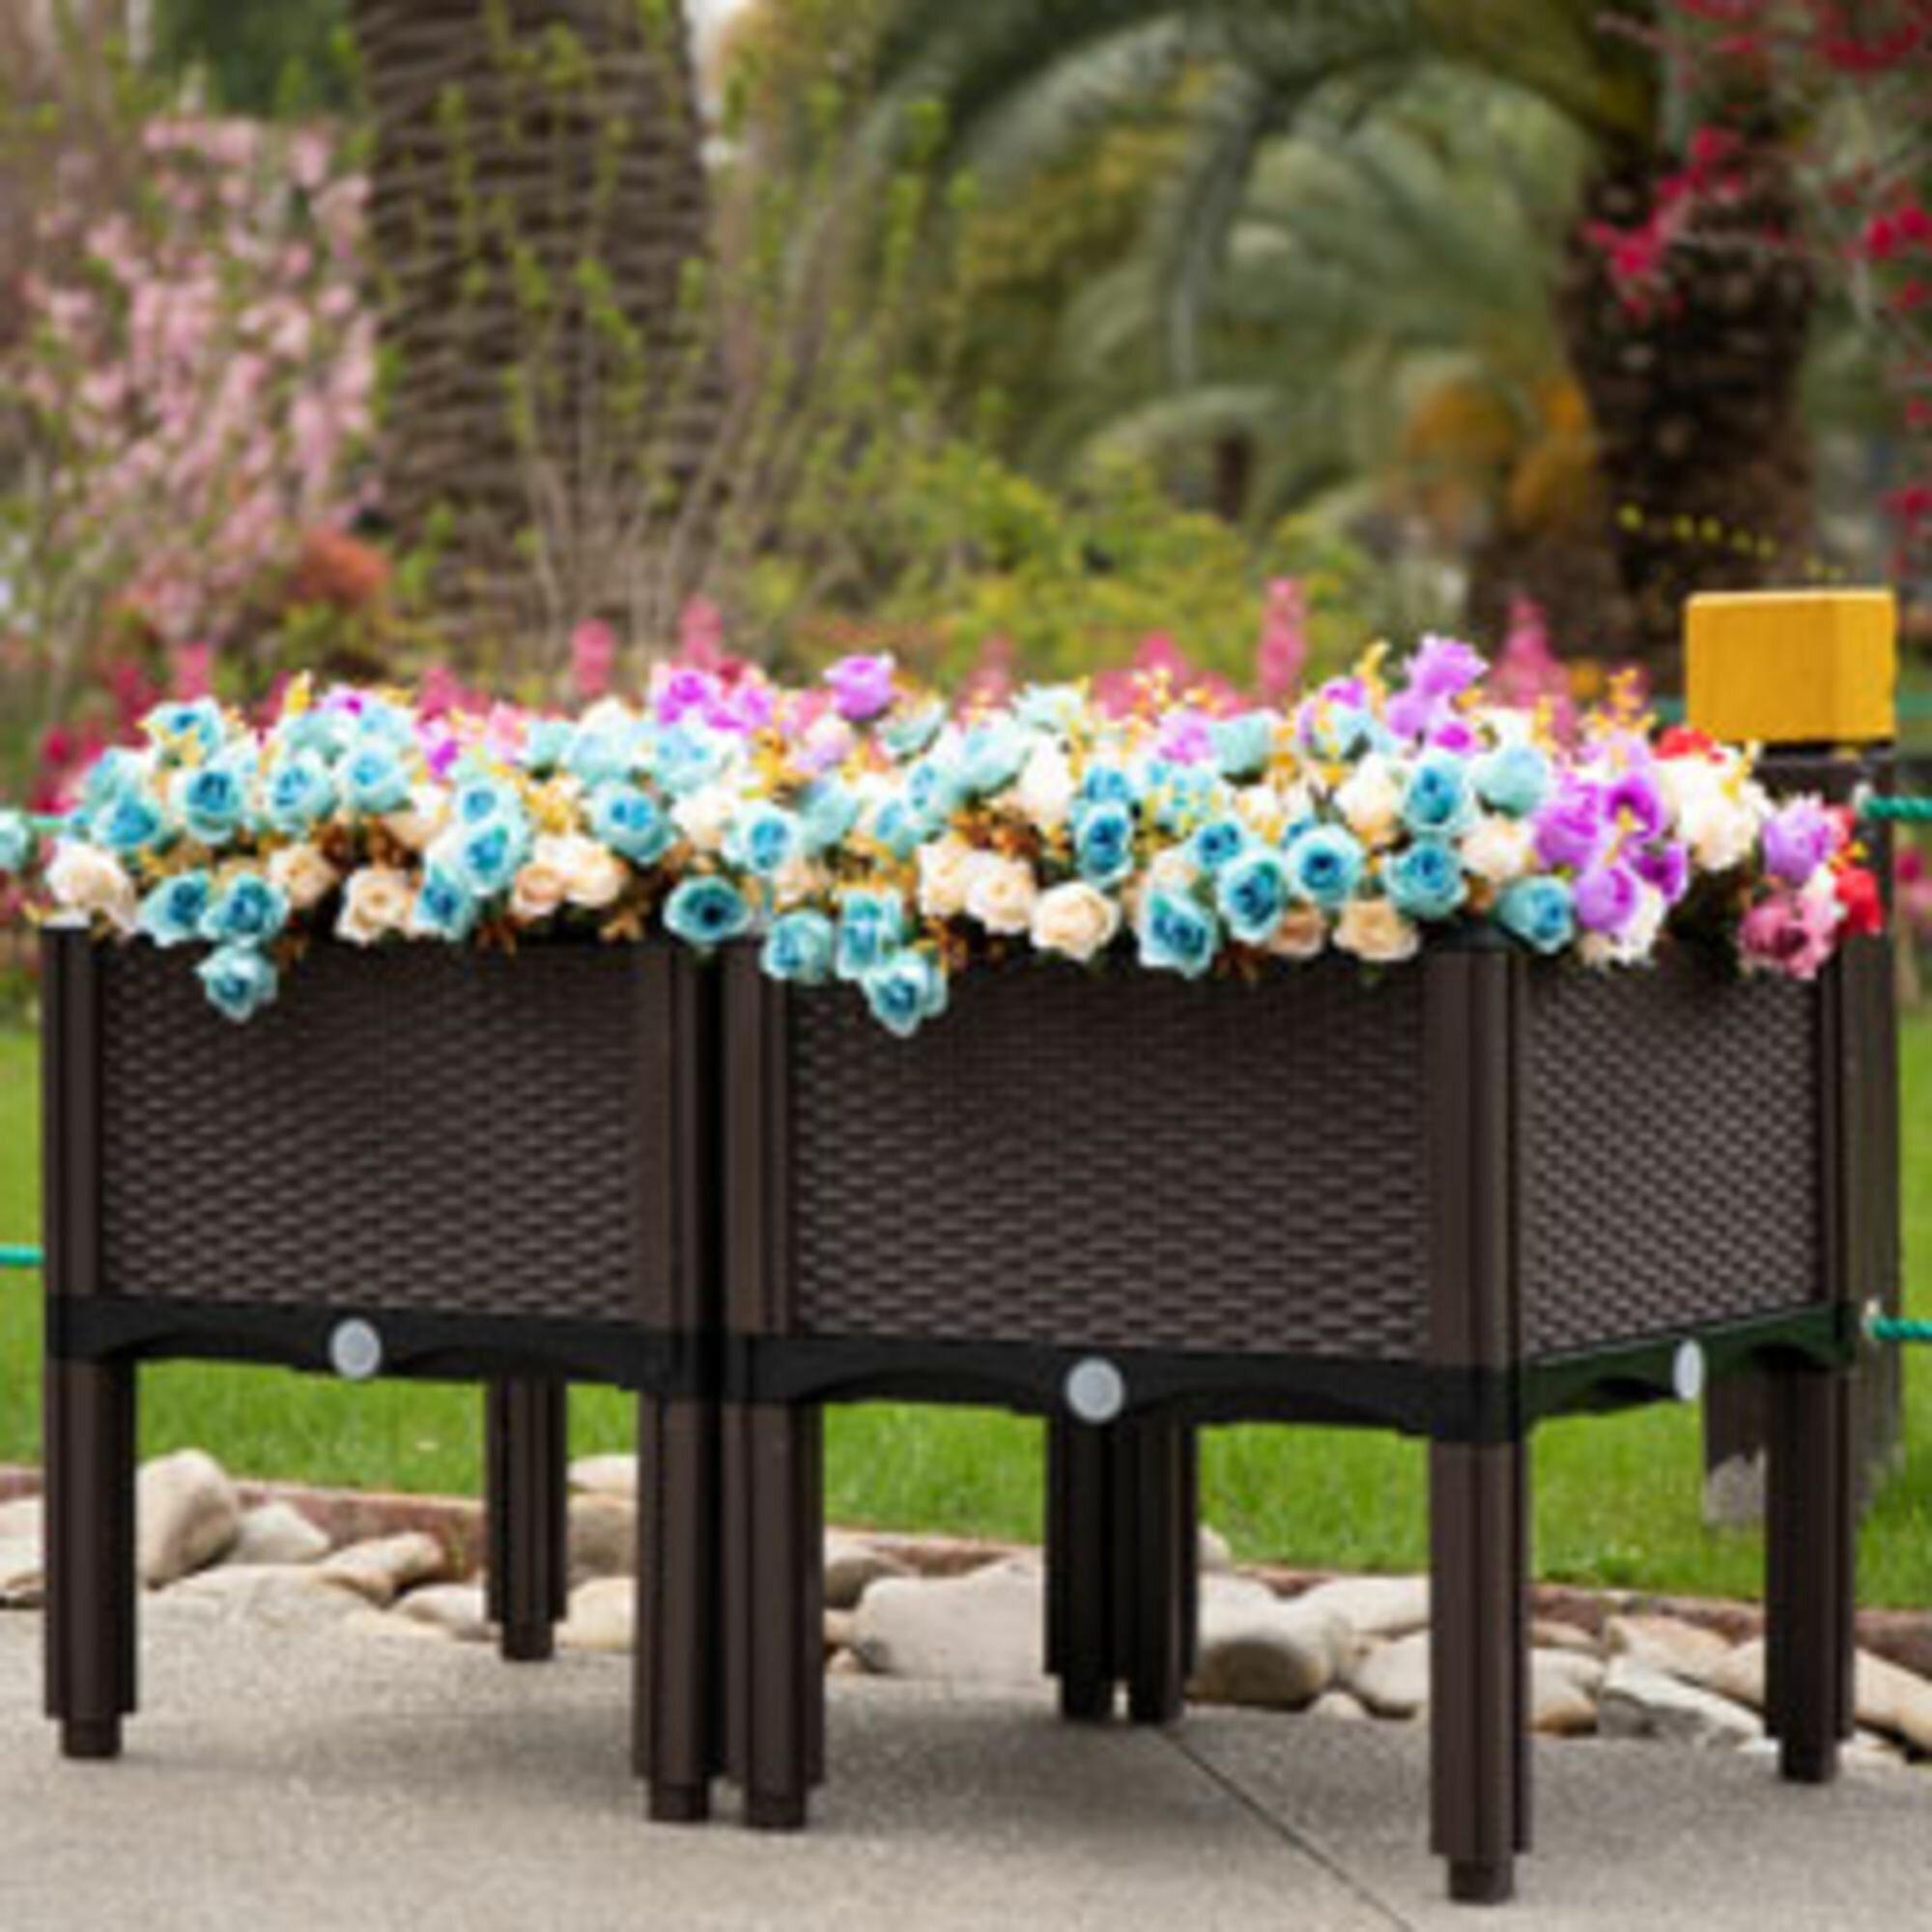 Arlmont Co Celestia Plastic Planter Box Reviews Wayfair Ca